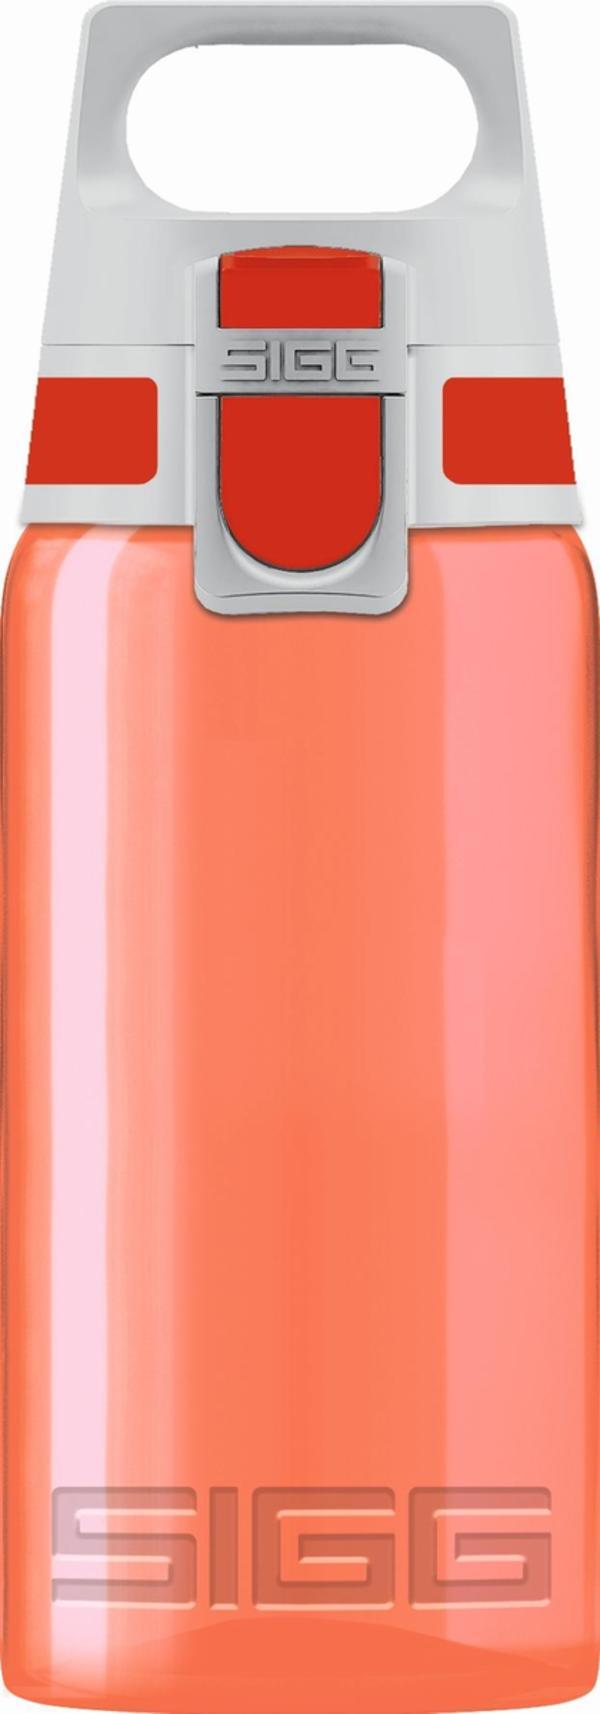 SIGG Kindertrinkflasche 500ml VIVA Red